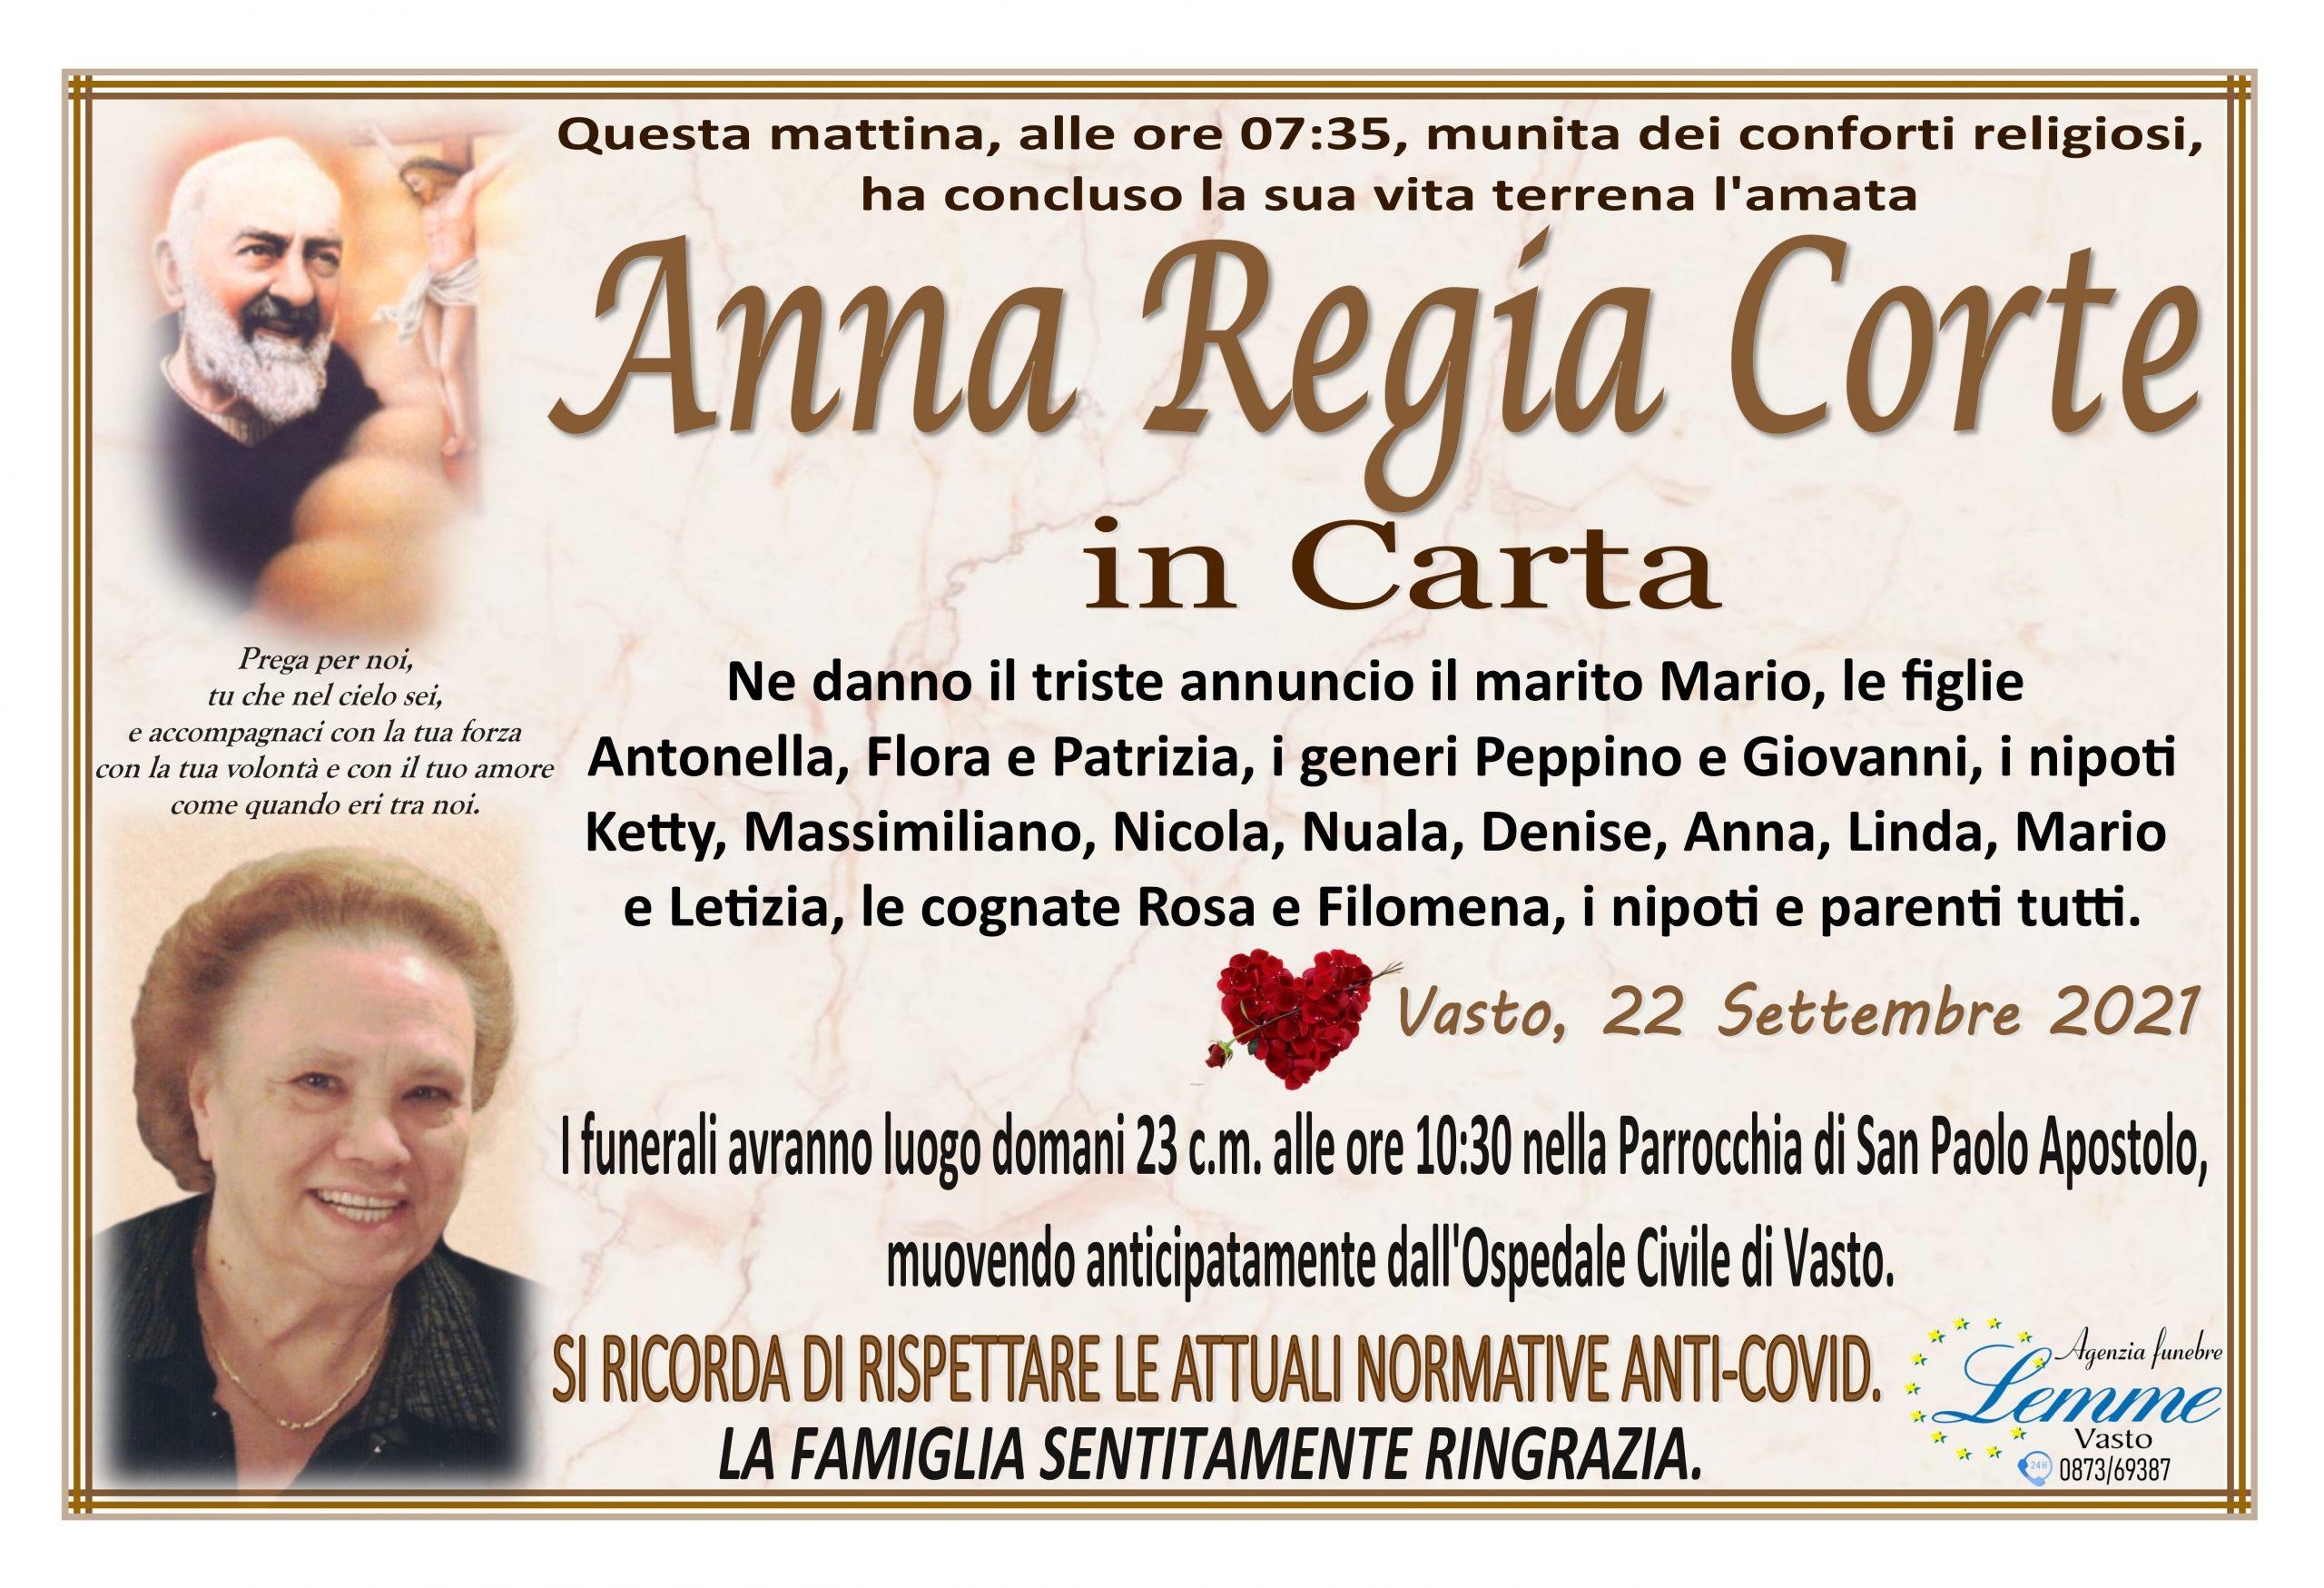 ANNA REGIA CORTE